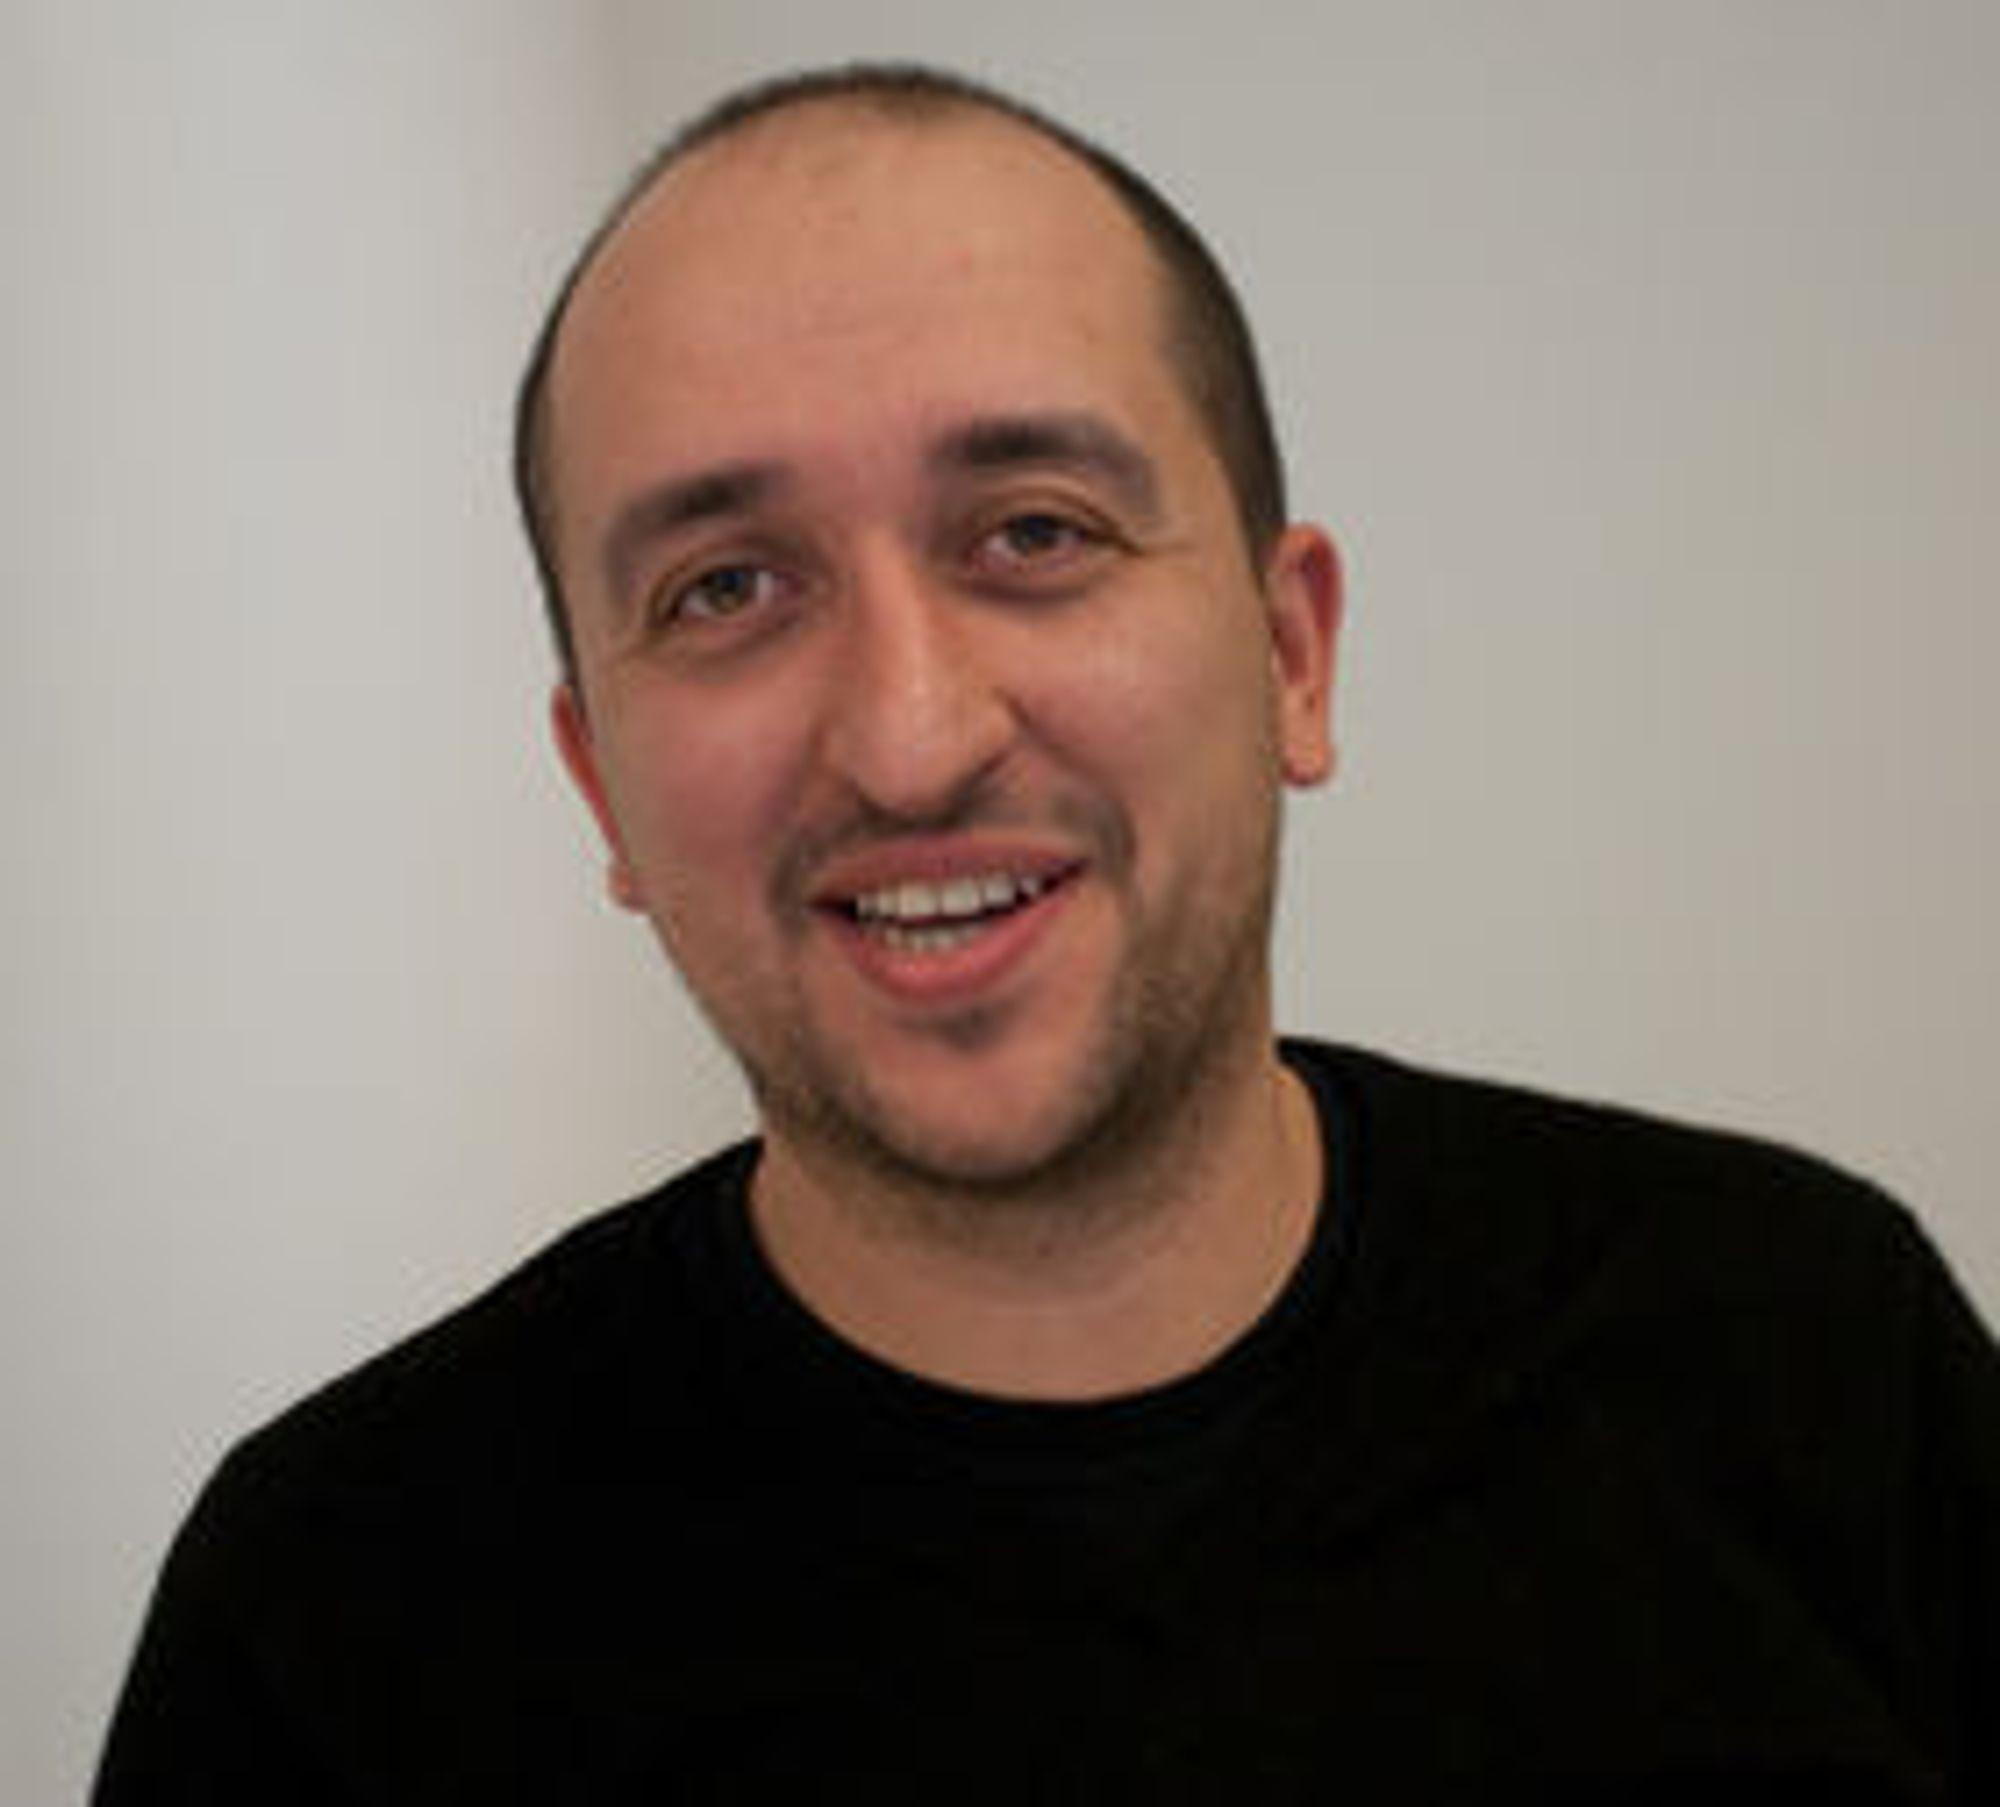 Nuno Sitima er direktør forretningsutvikling i Opera Software.